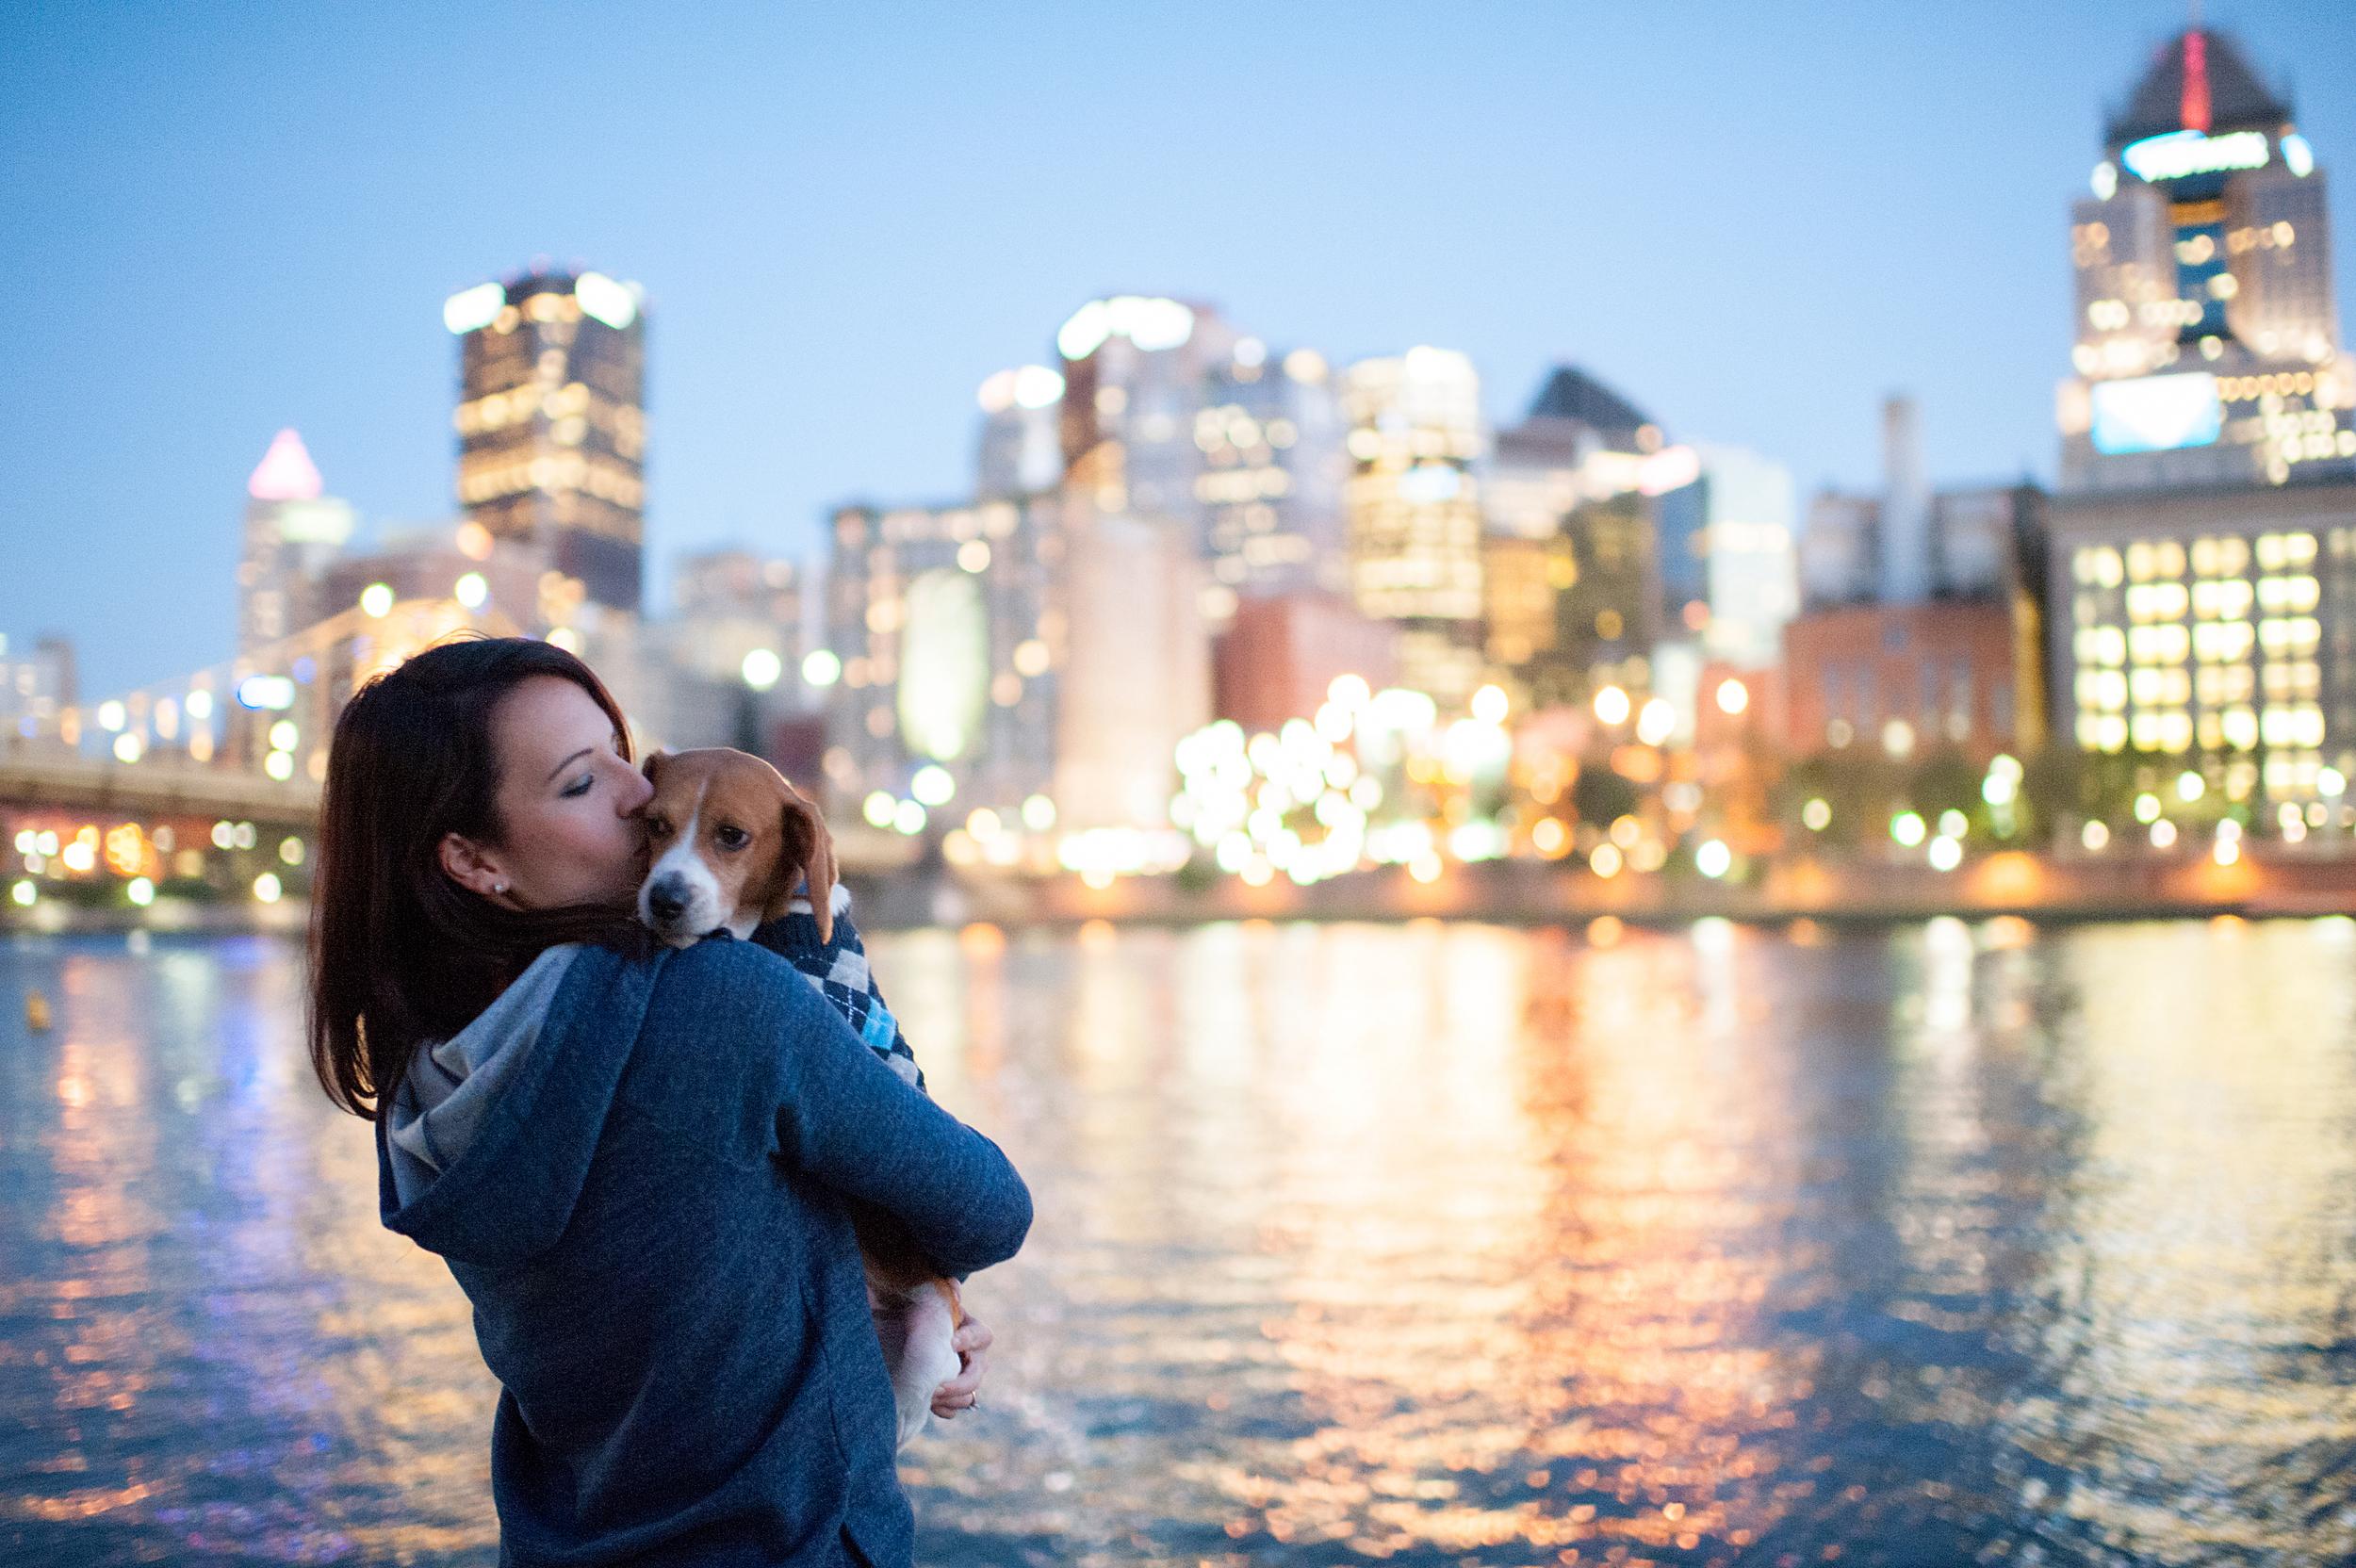 dexter jack-a-bee dog photography pittsburgh 032.jpg